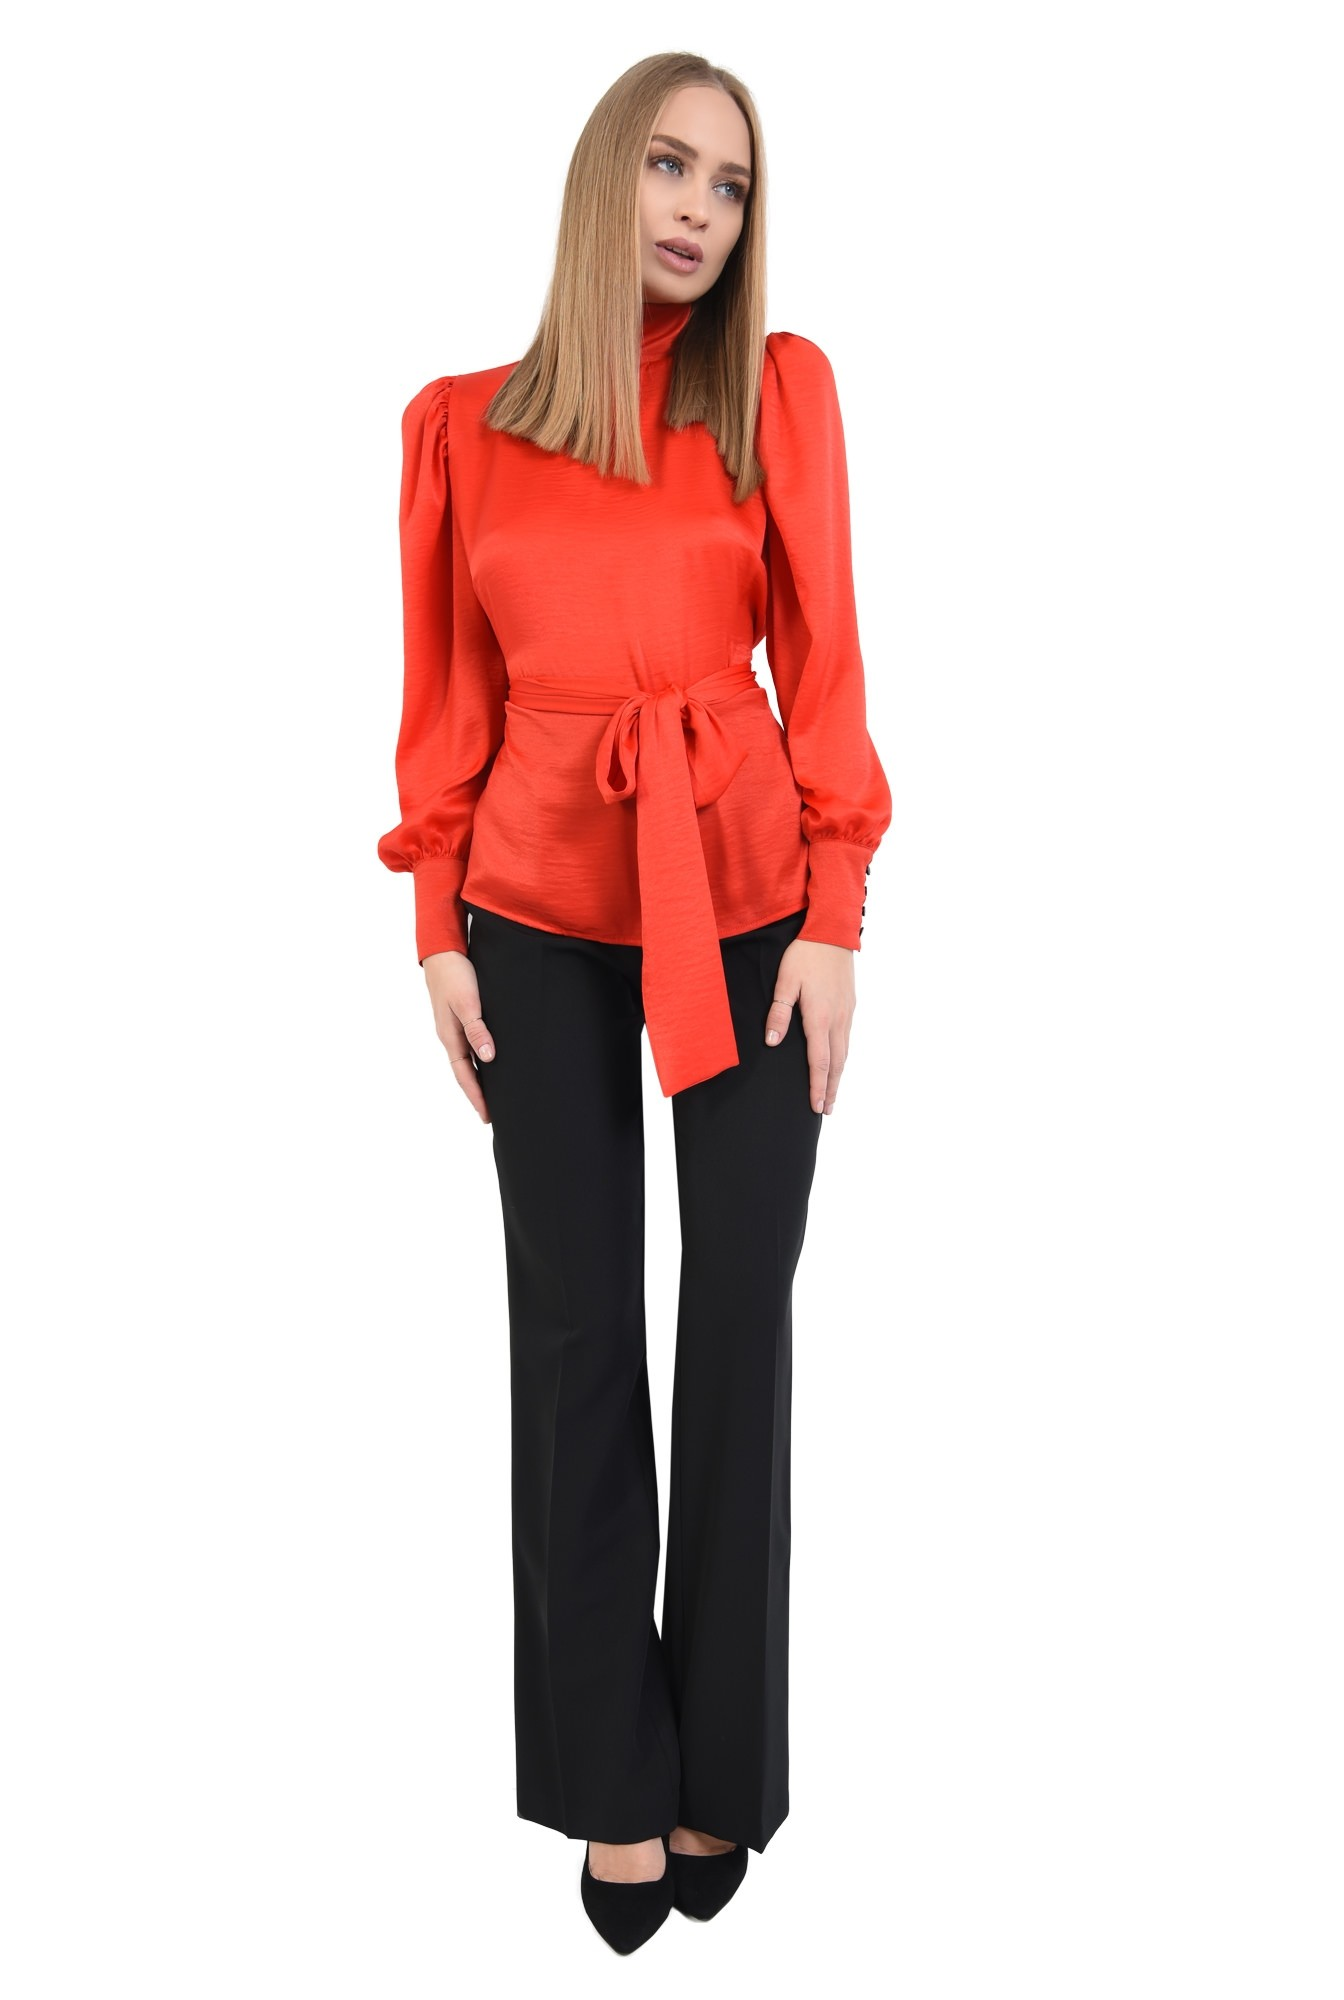 3 - 360 - bluza de ocazie, rosu, cu funda, cu maneci lungi